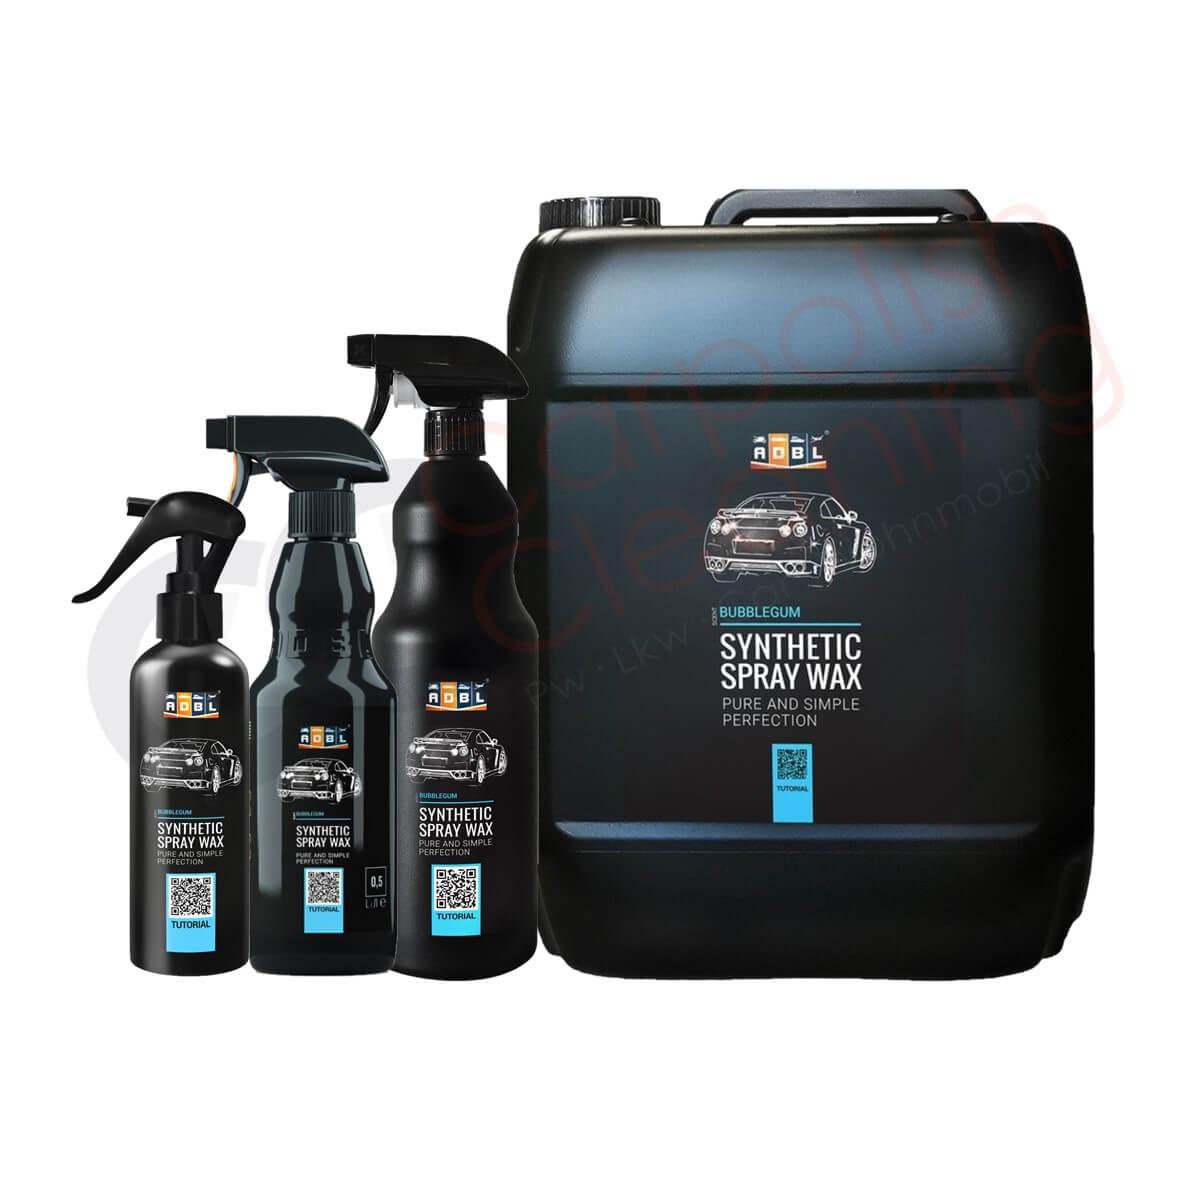 ADBL Synthetic Spray Wax Sprühwachs